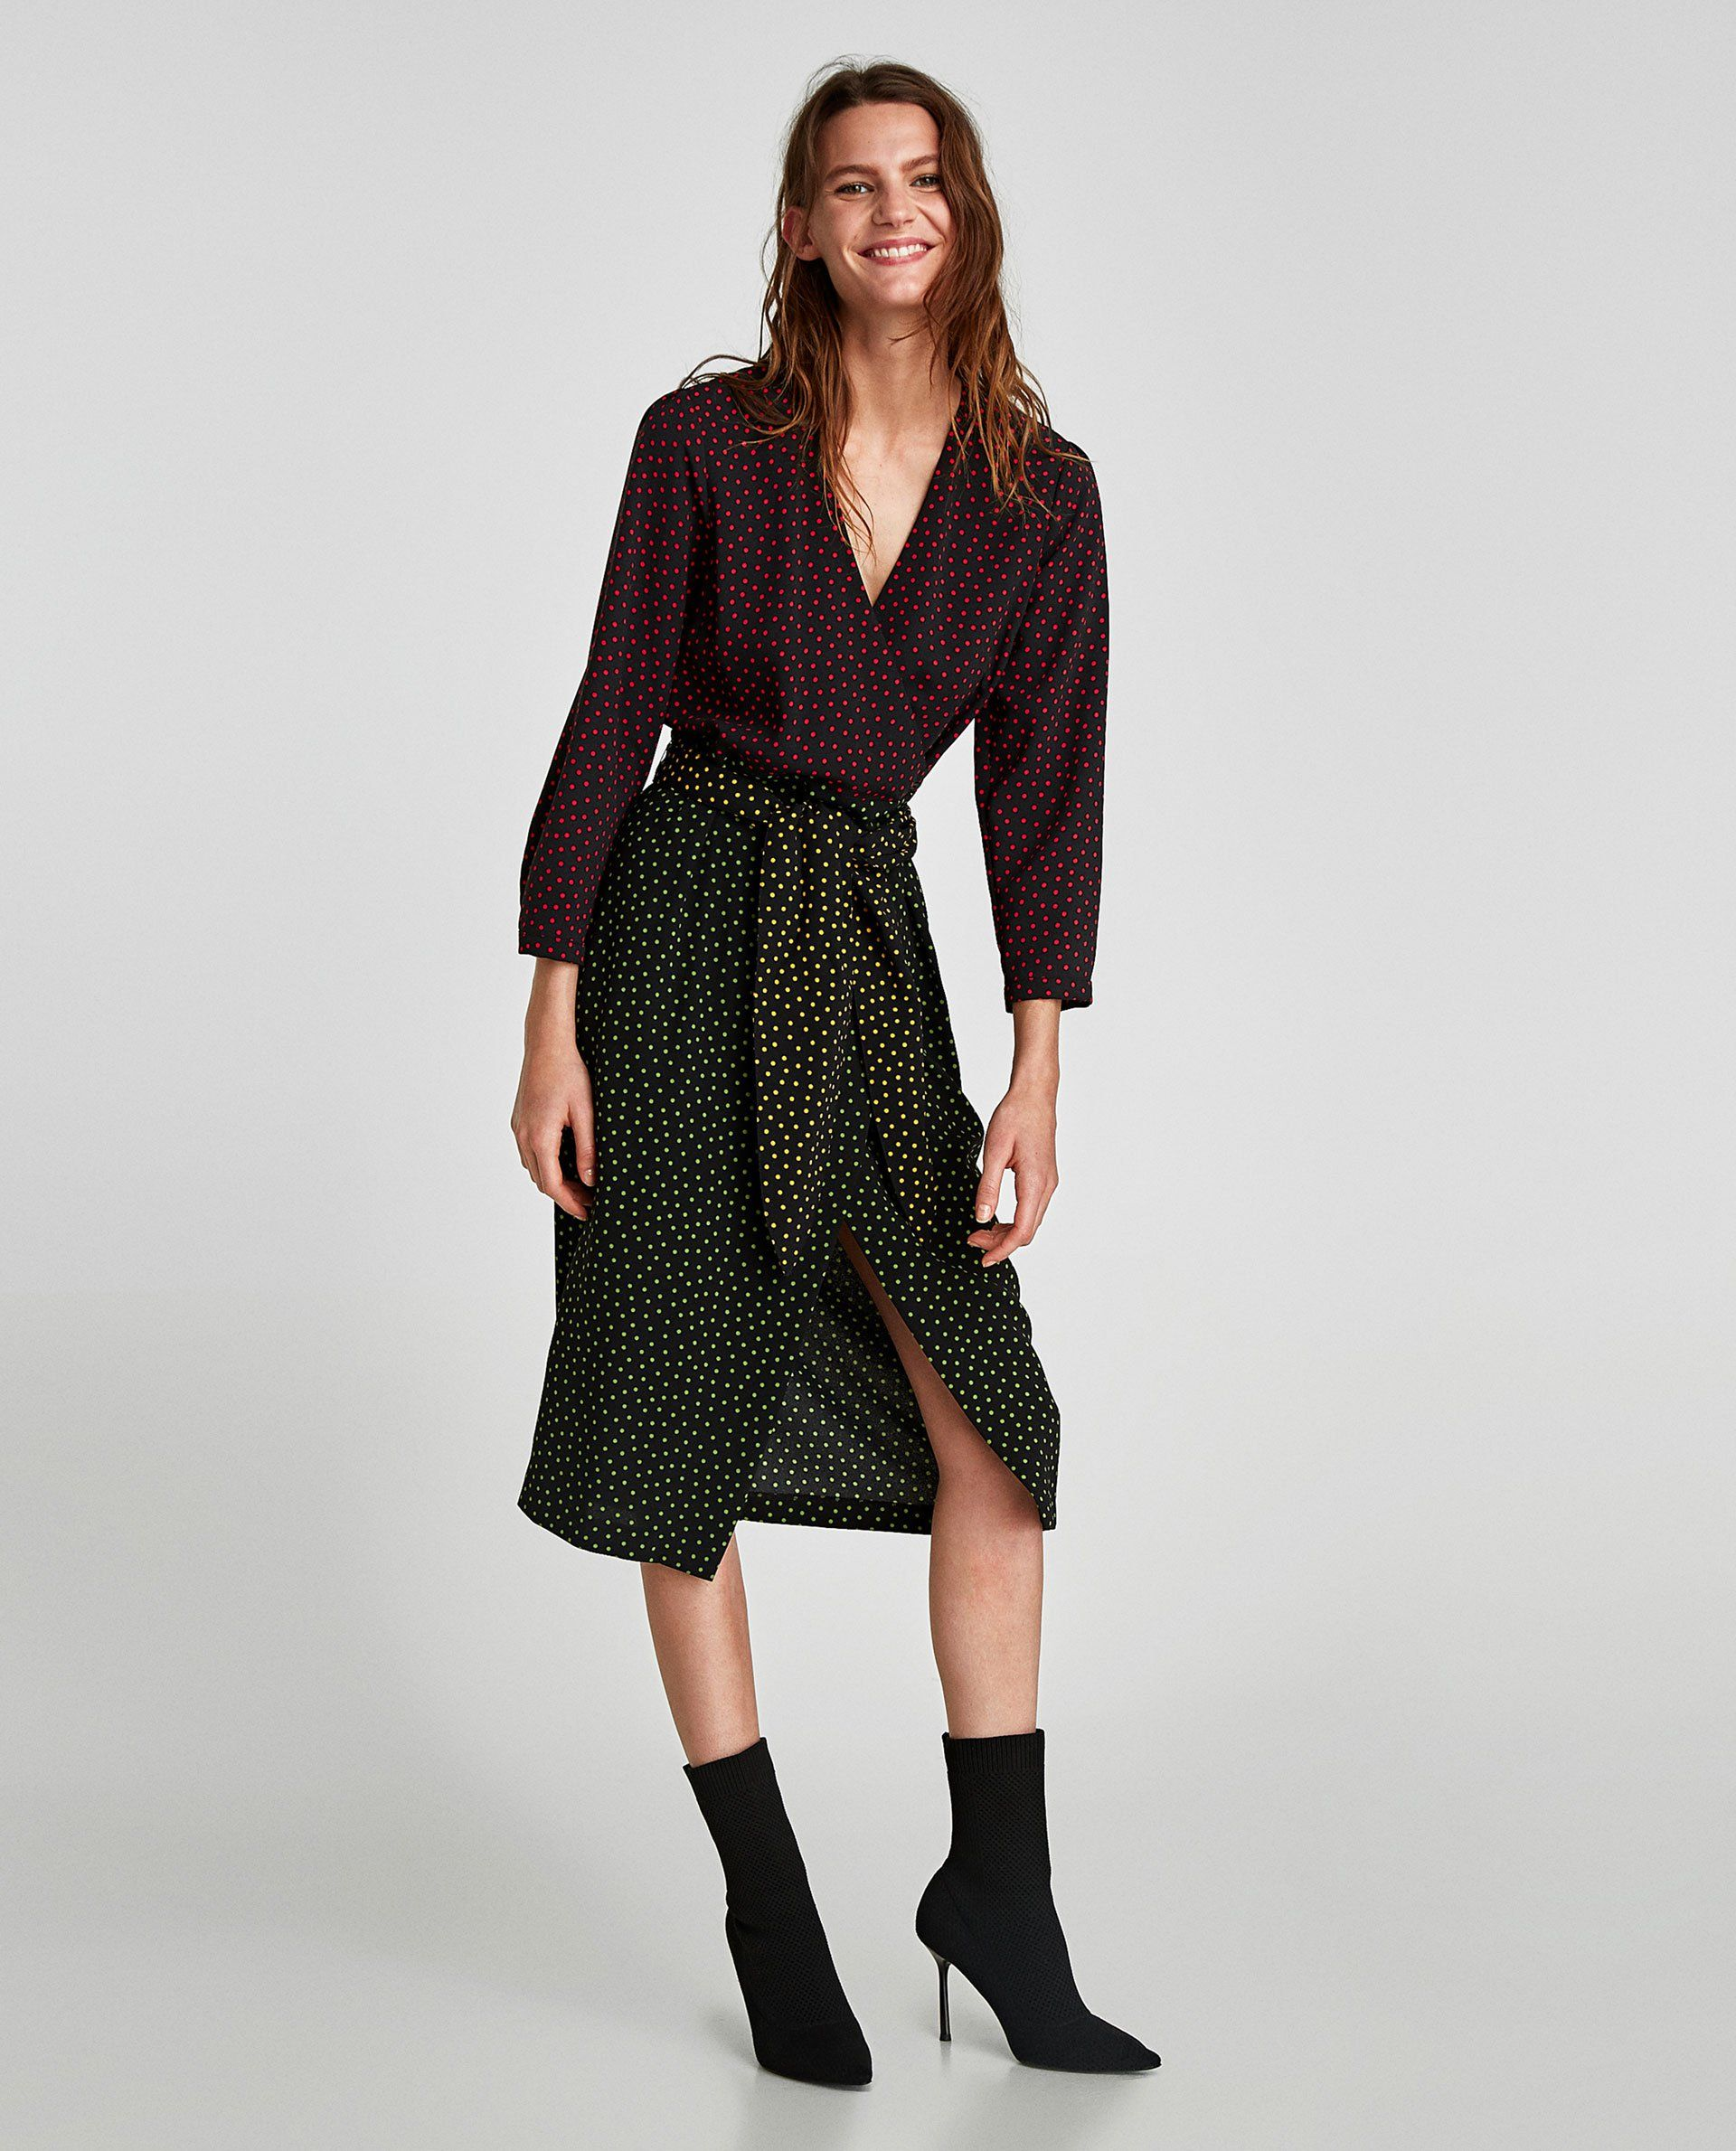 Zara Polka Dot Wrap Dress Dresses Tweed Mini Skirt Wrap Dress